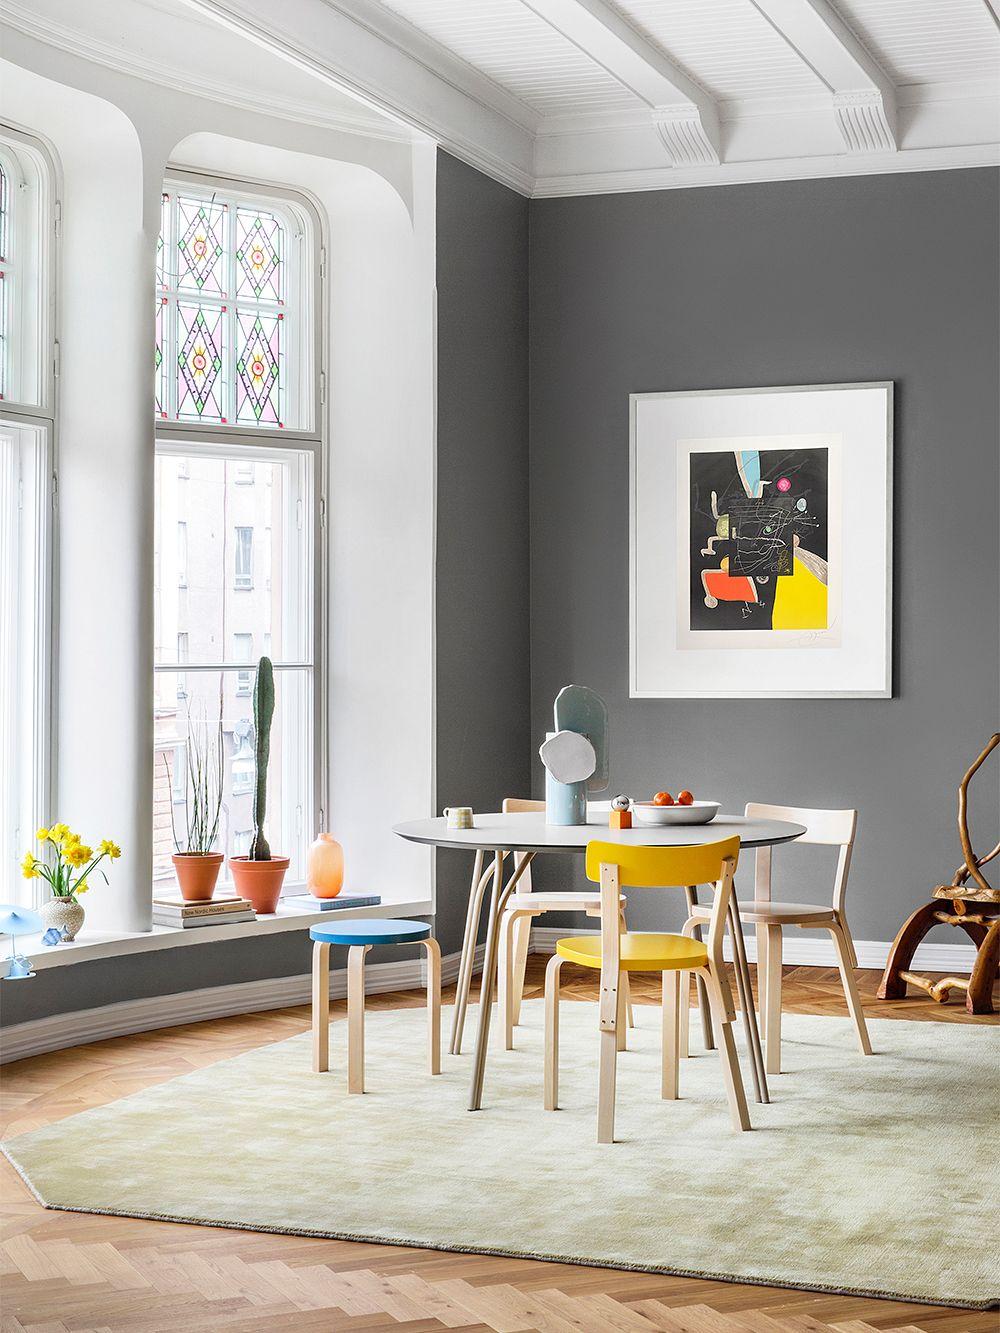 Joan Miró fine art print